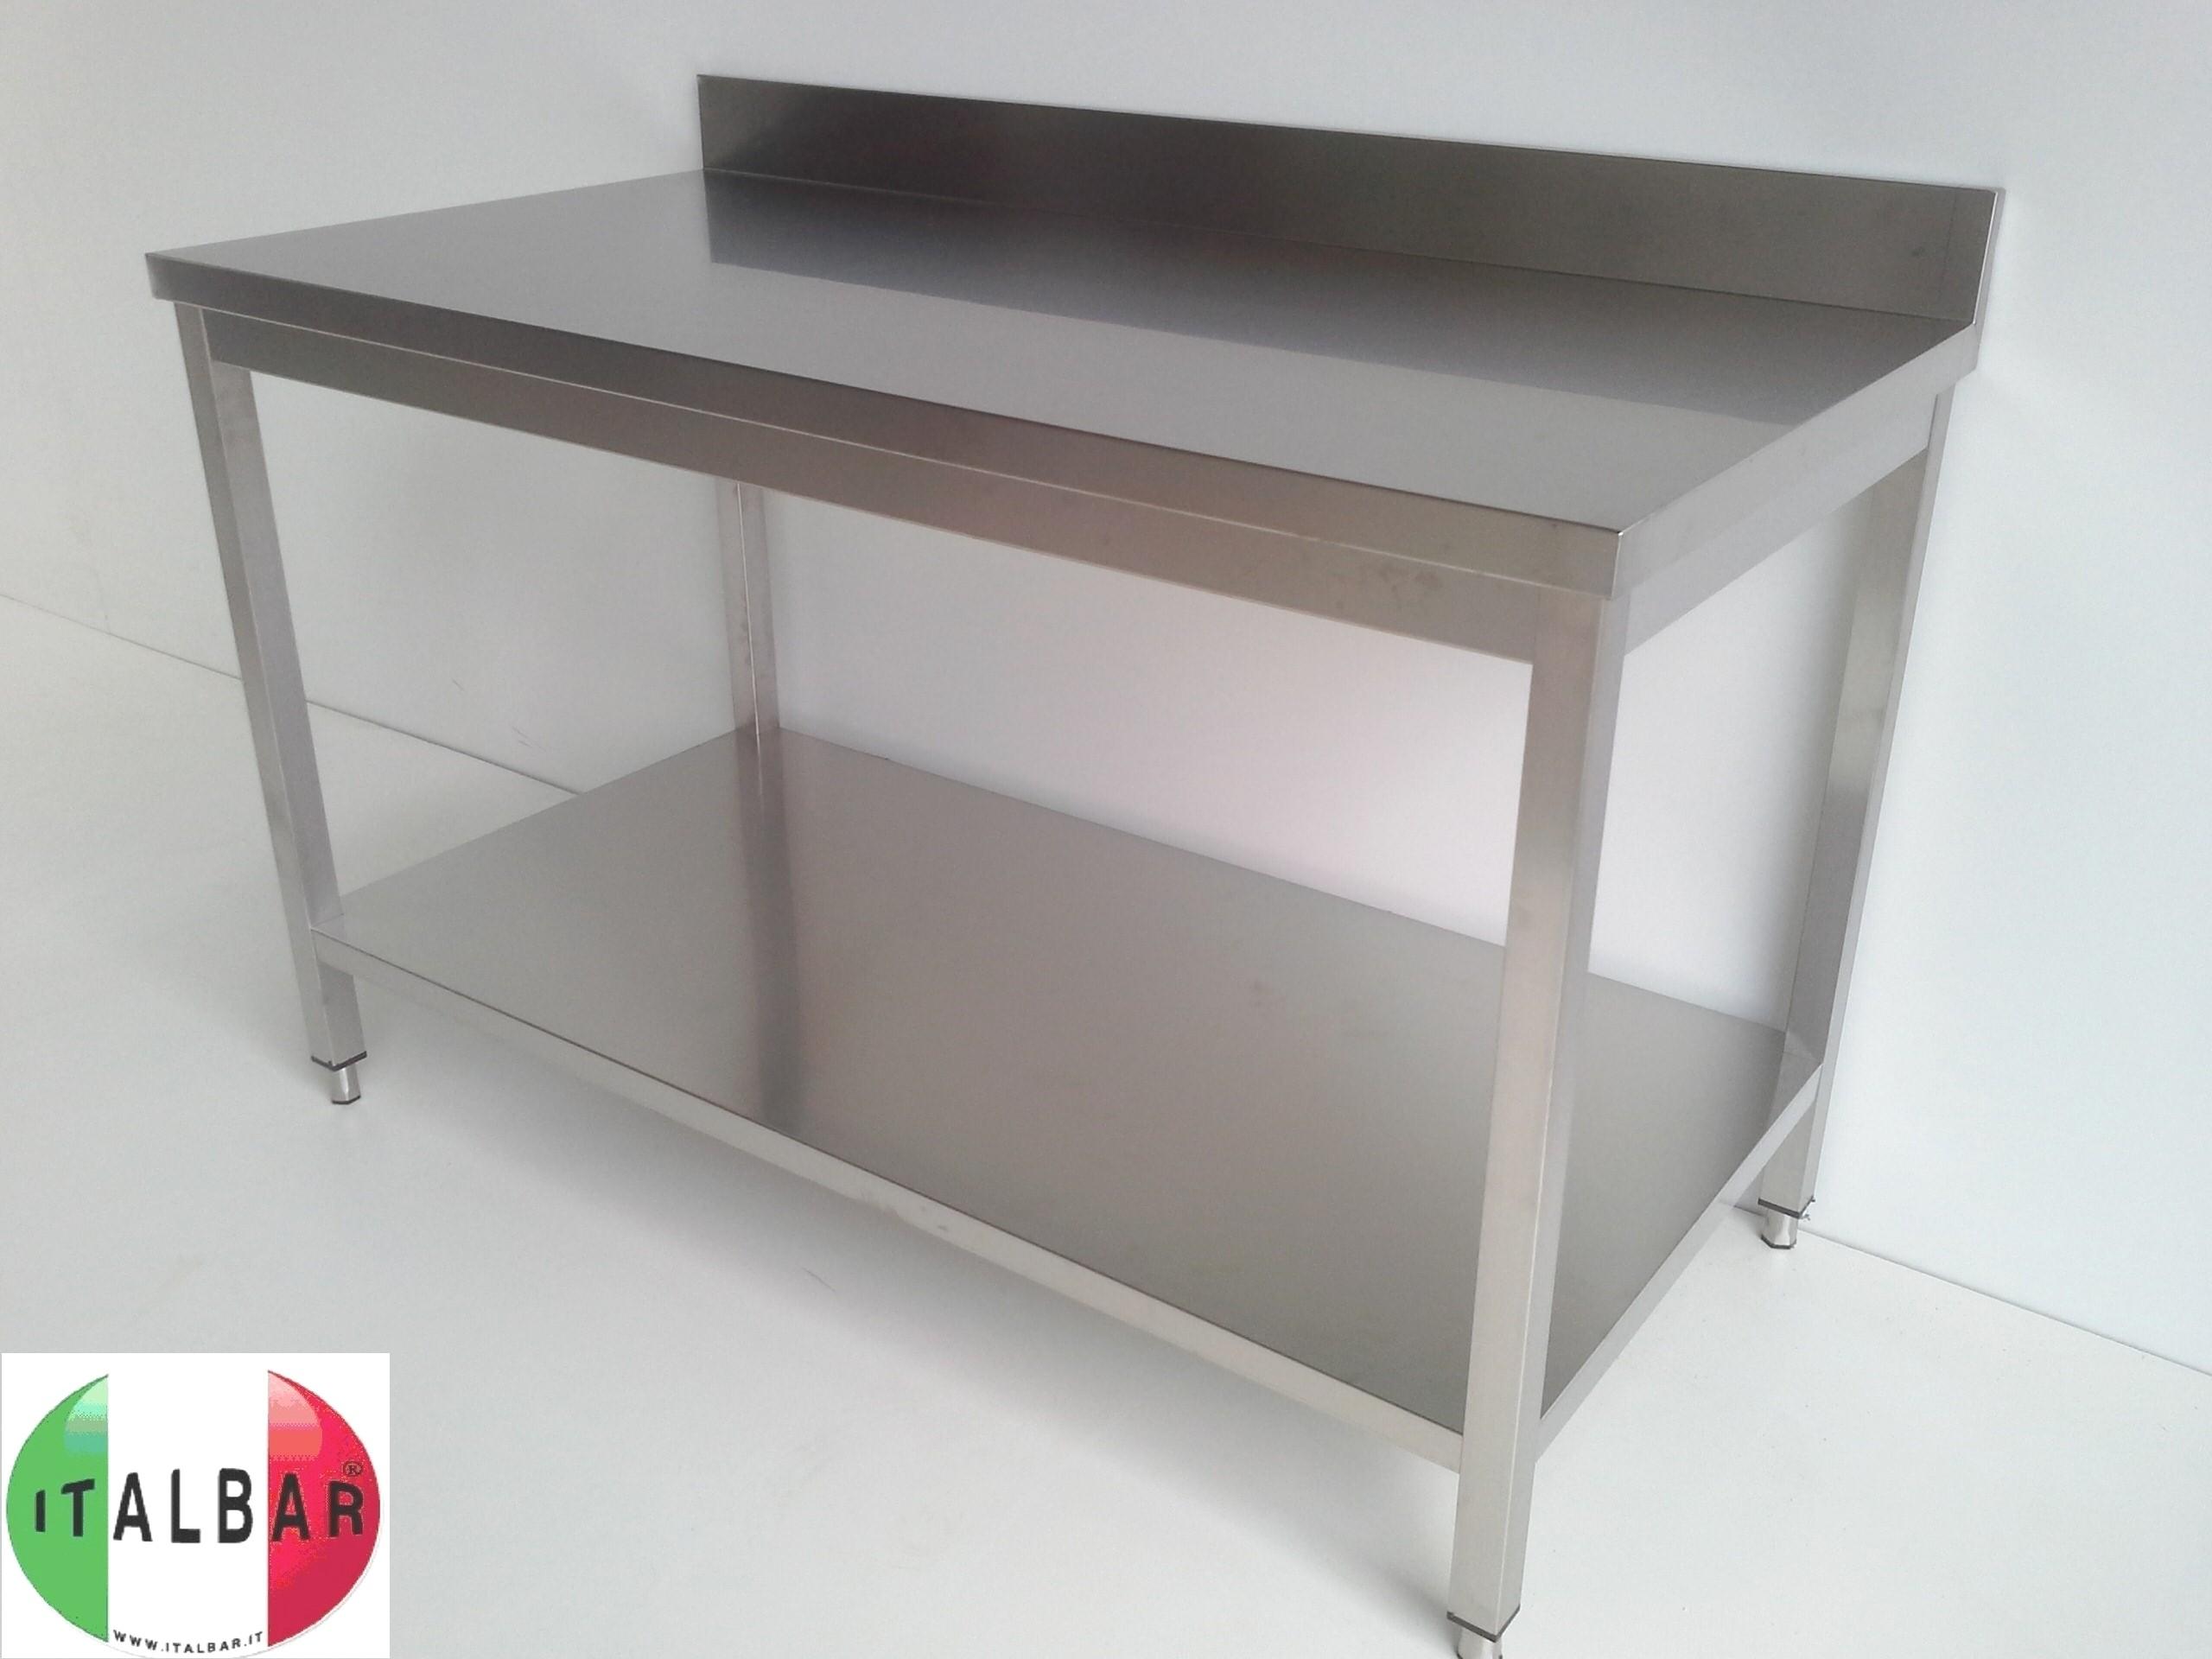 Italbar banconi bar banchi frigo vetrine refrigerate tavolo inox con ripiano cm - Tavolo in acciaio inox usato ...